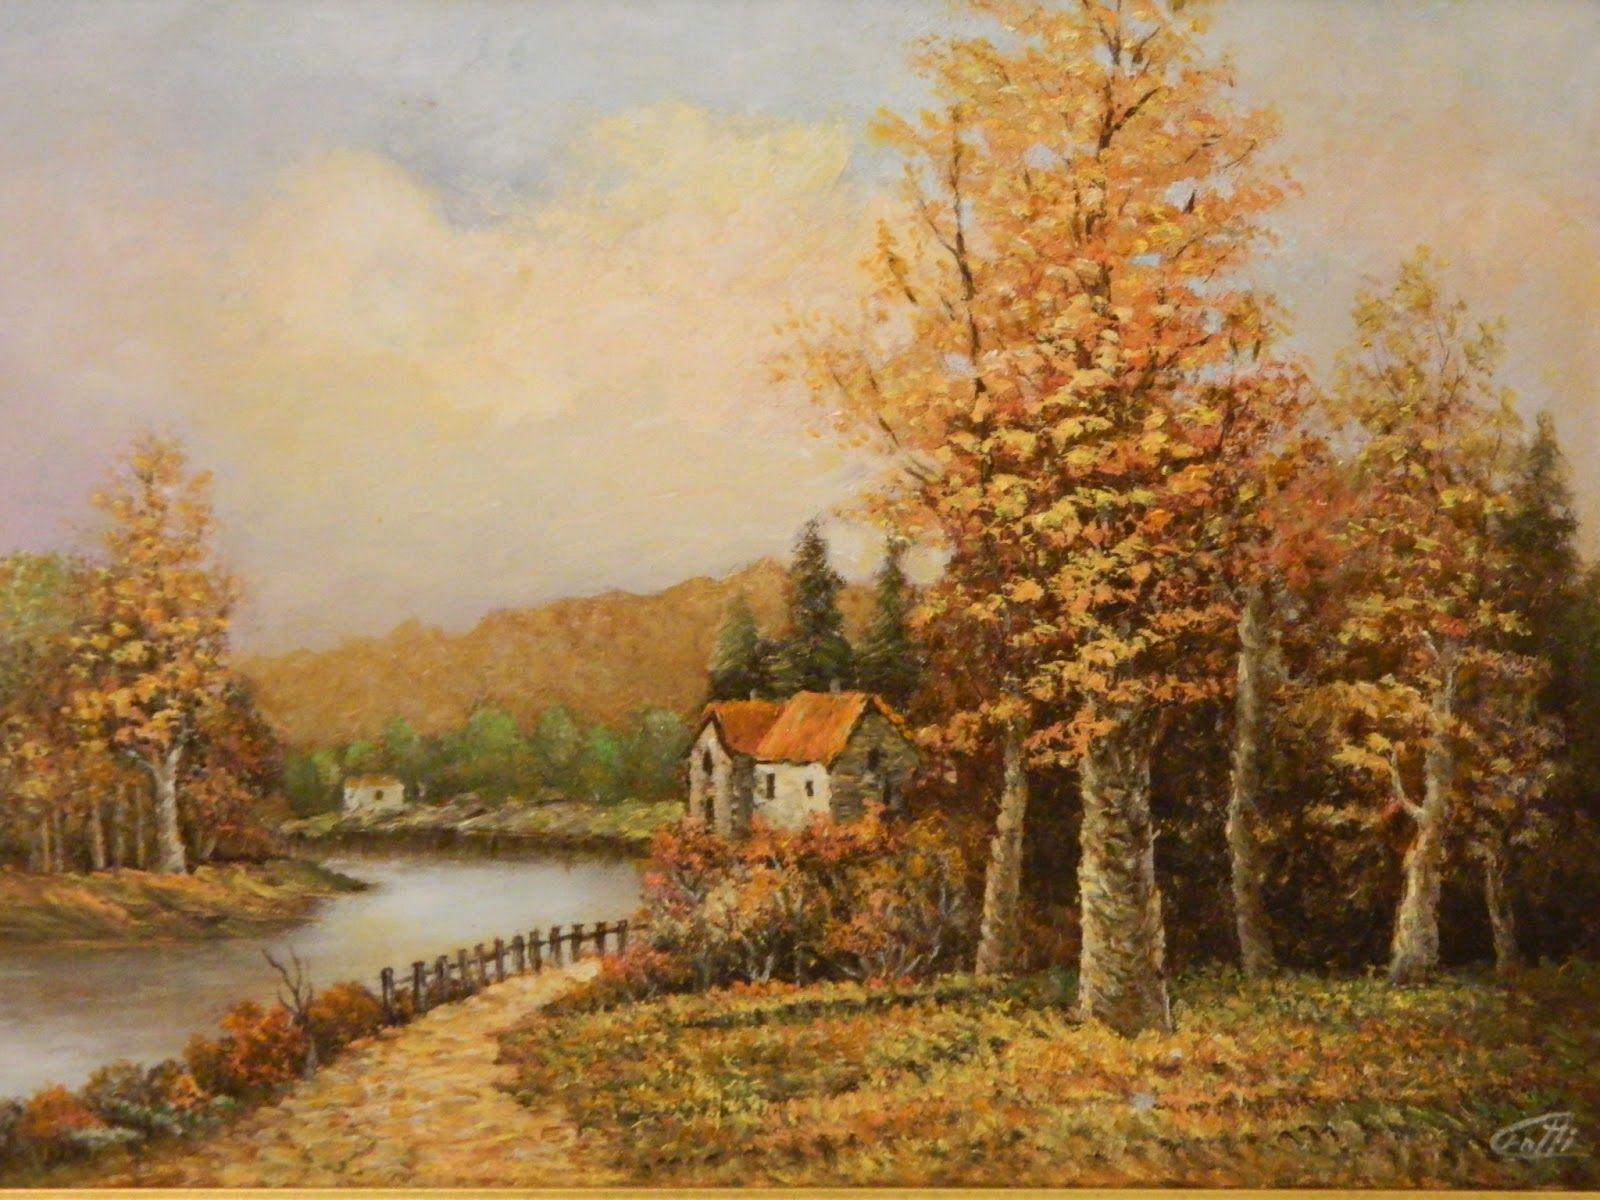 Dipinti Paesaggi Autunnali Francy Pinterest